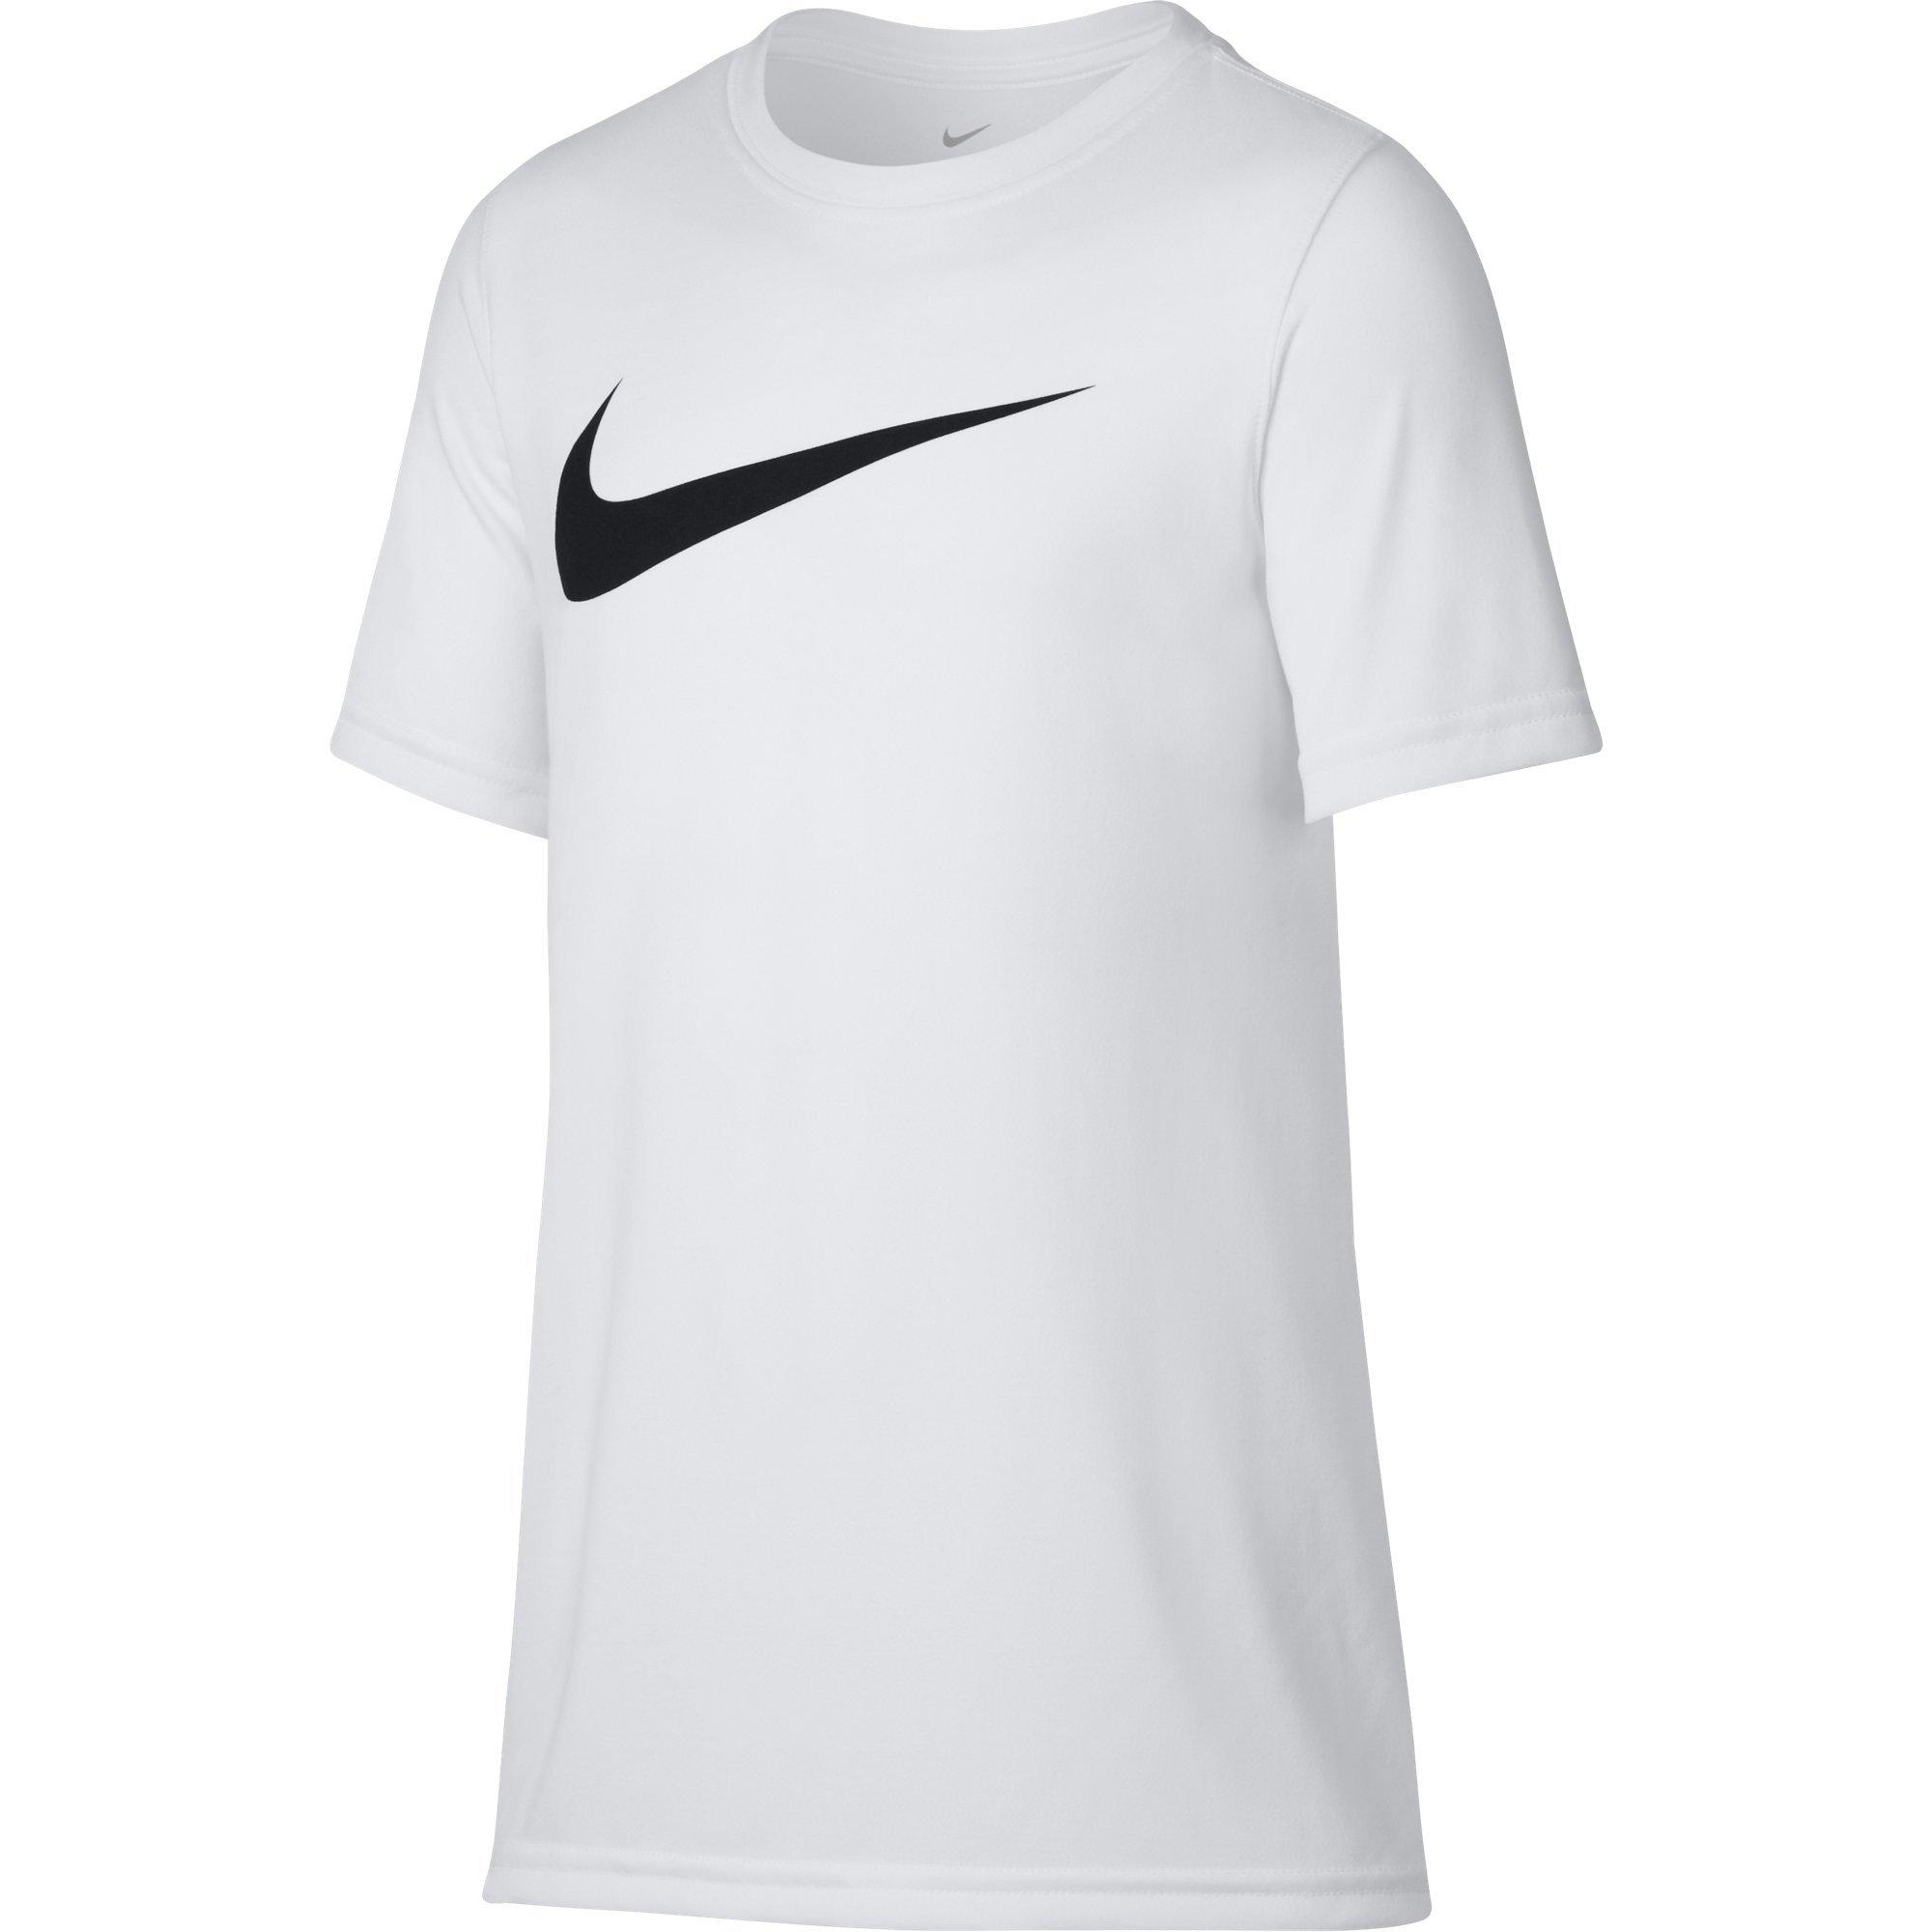 NIKE Boys' Dry Short Sleeve Swoosh Solid Tee, White/Black, X-Small